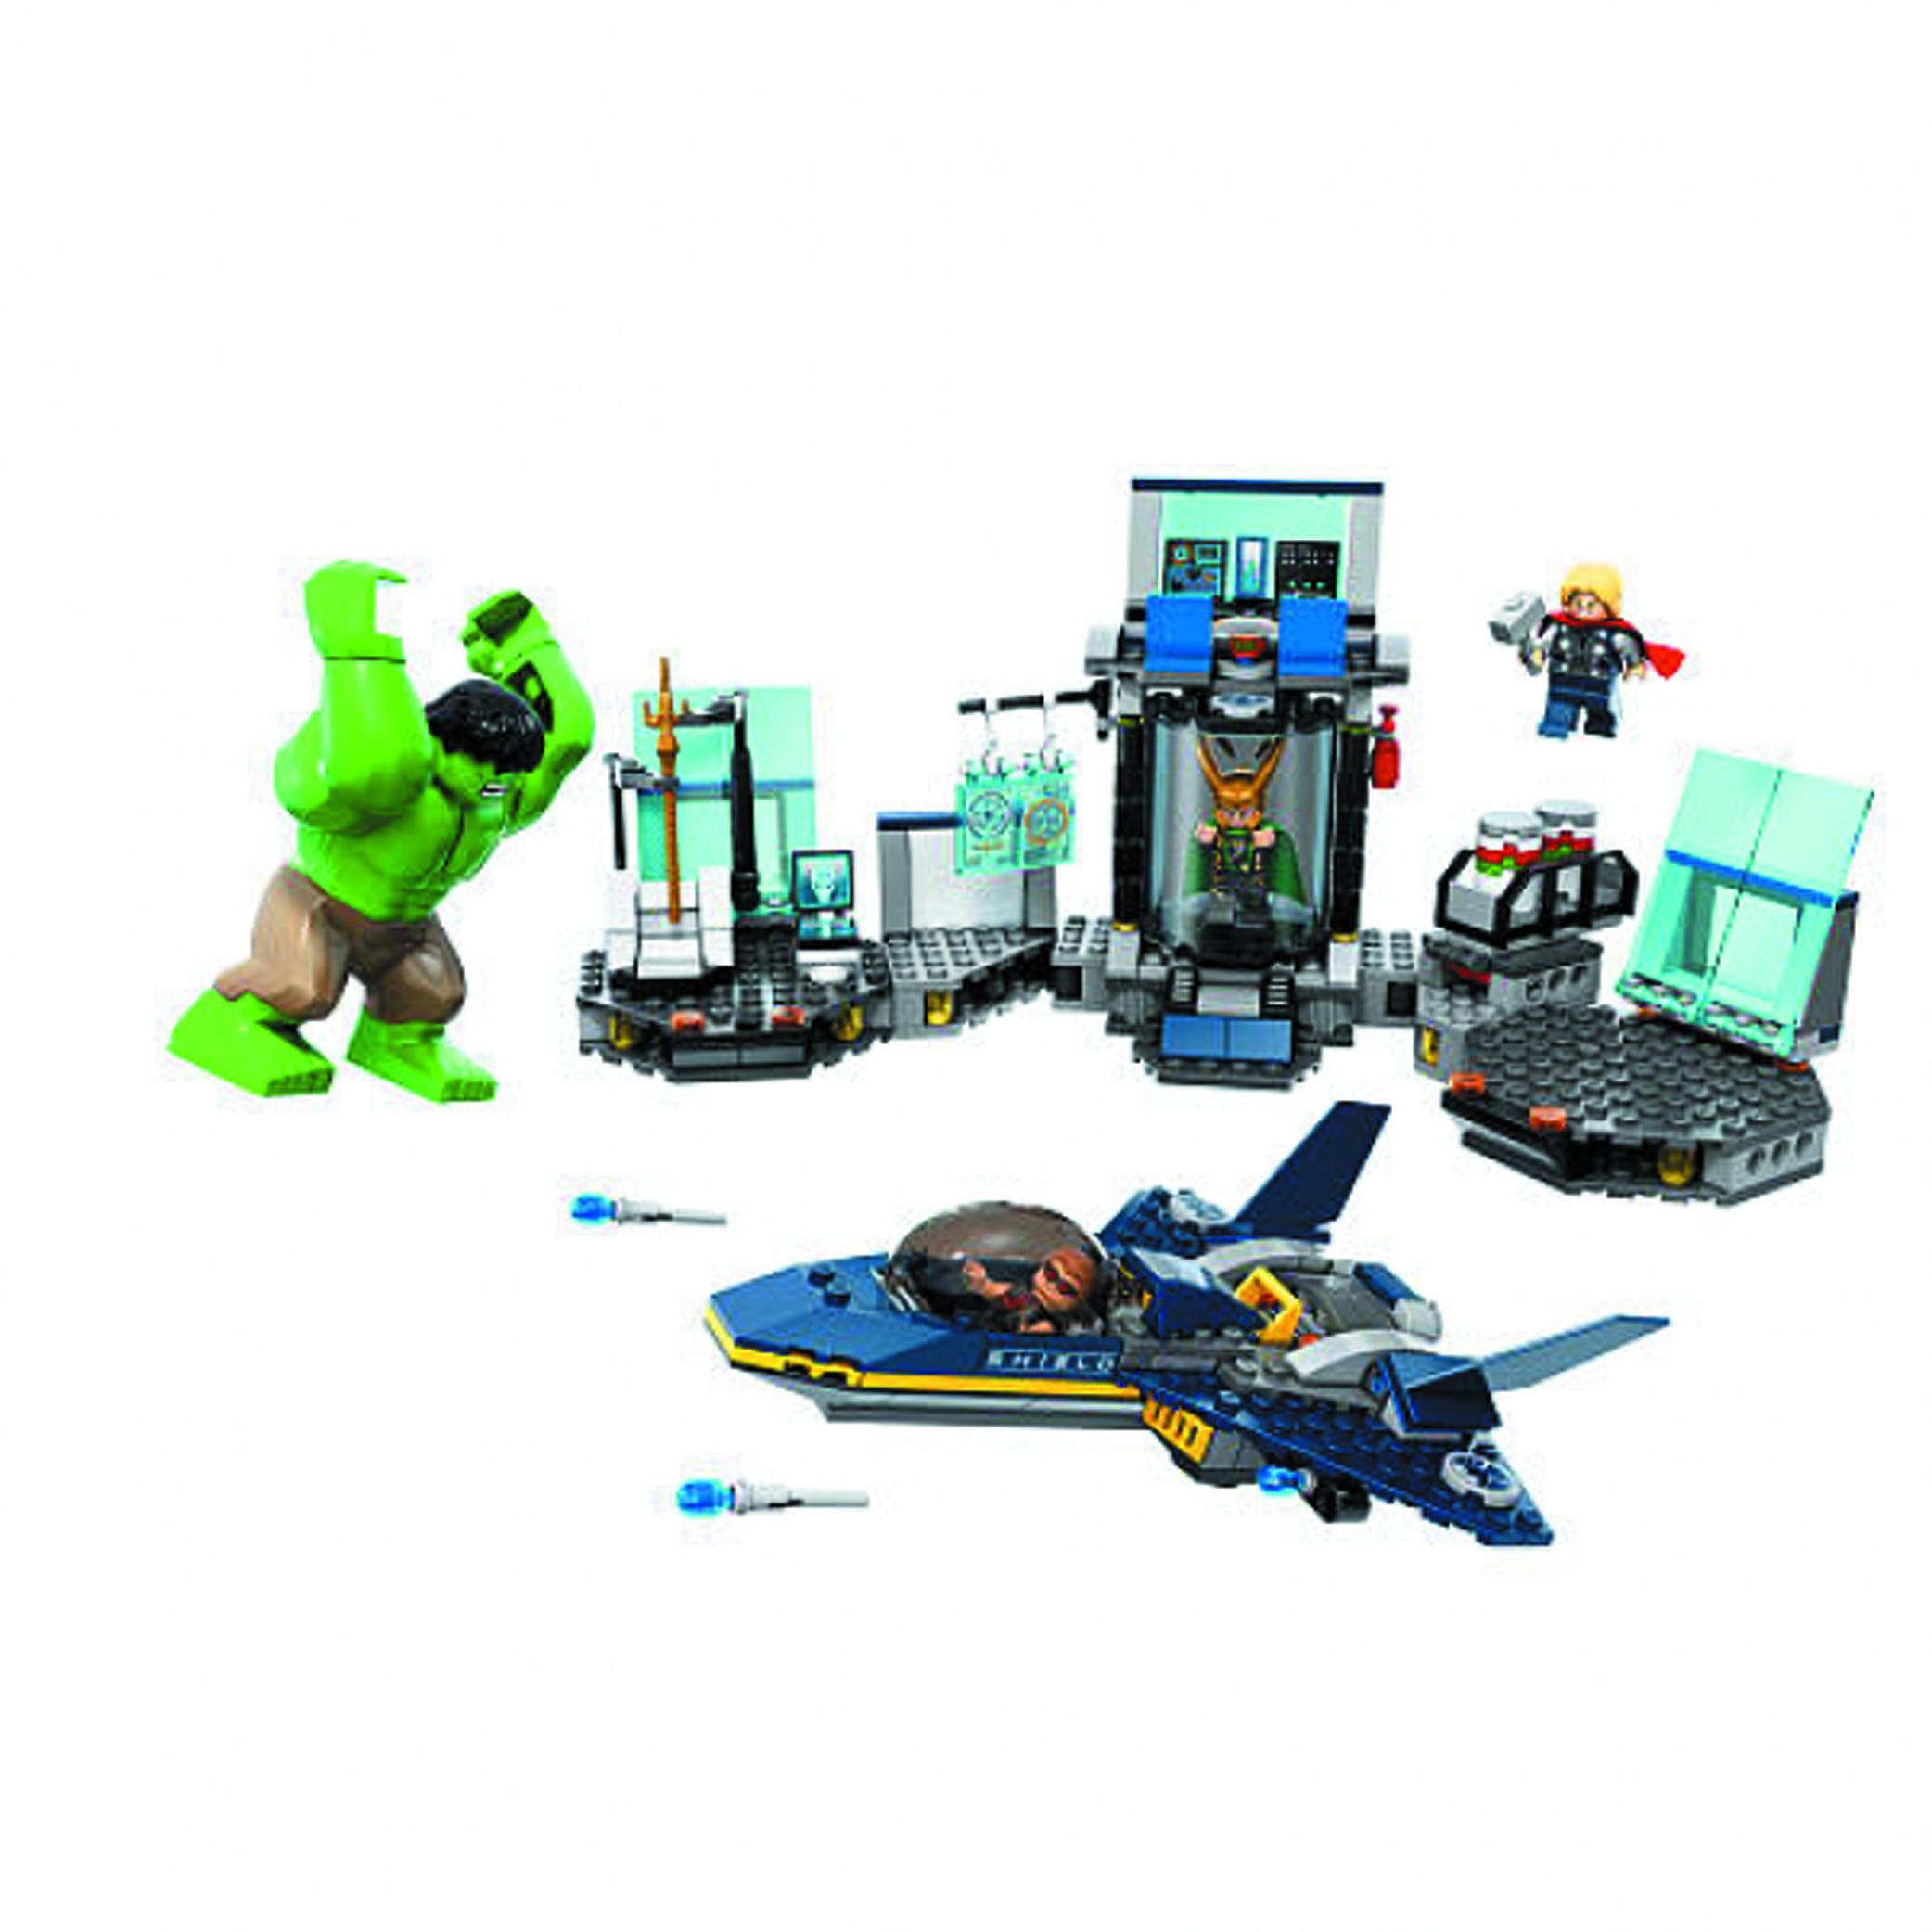 PREVIEWSworld - LEGO MARVEL HULK HELICARRIER BREAKOUT SET ...